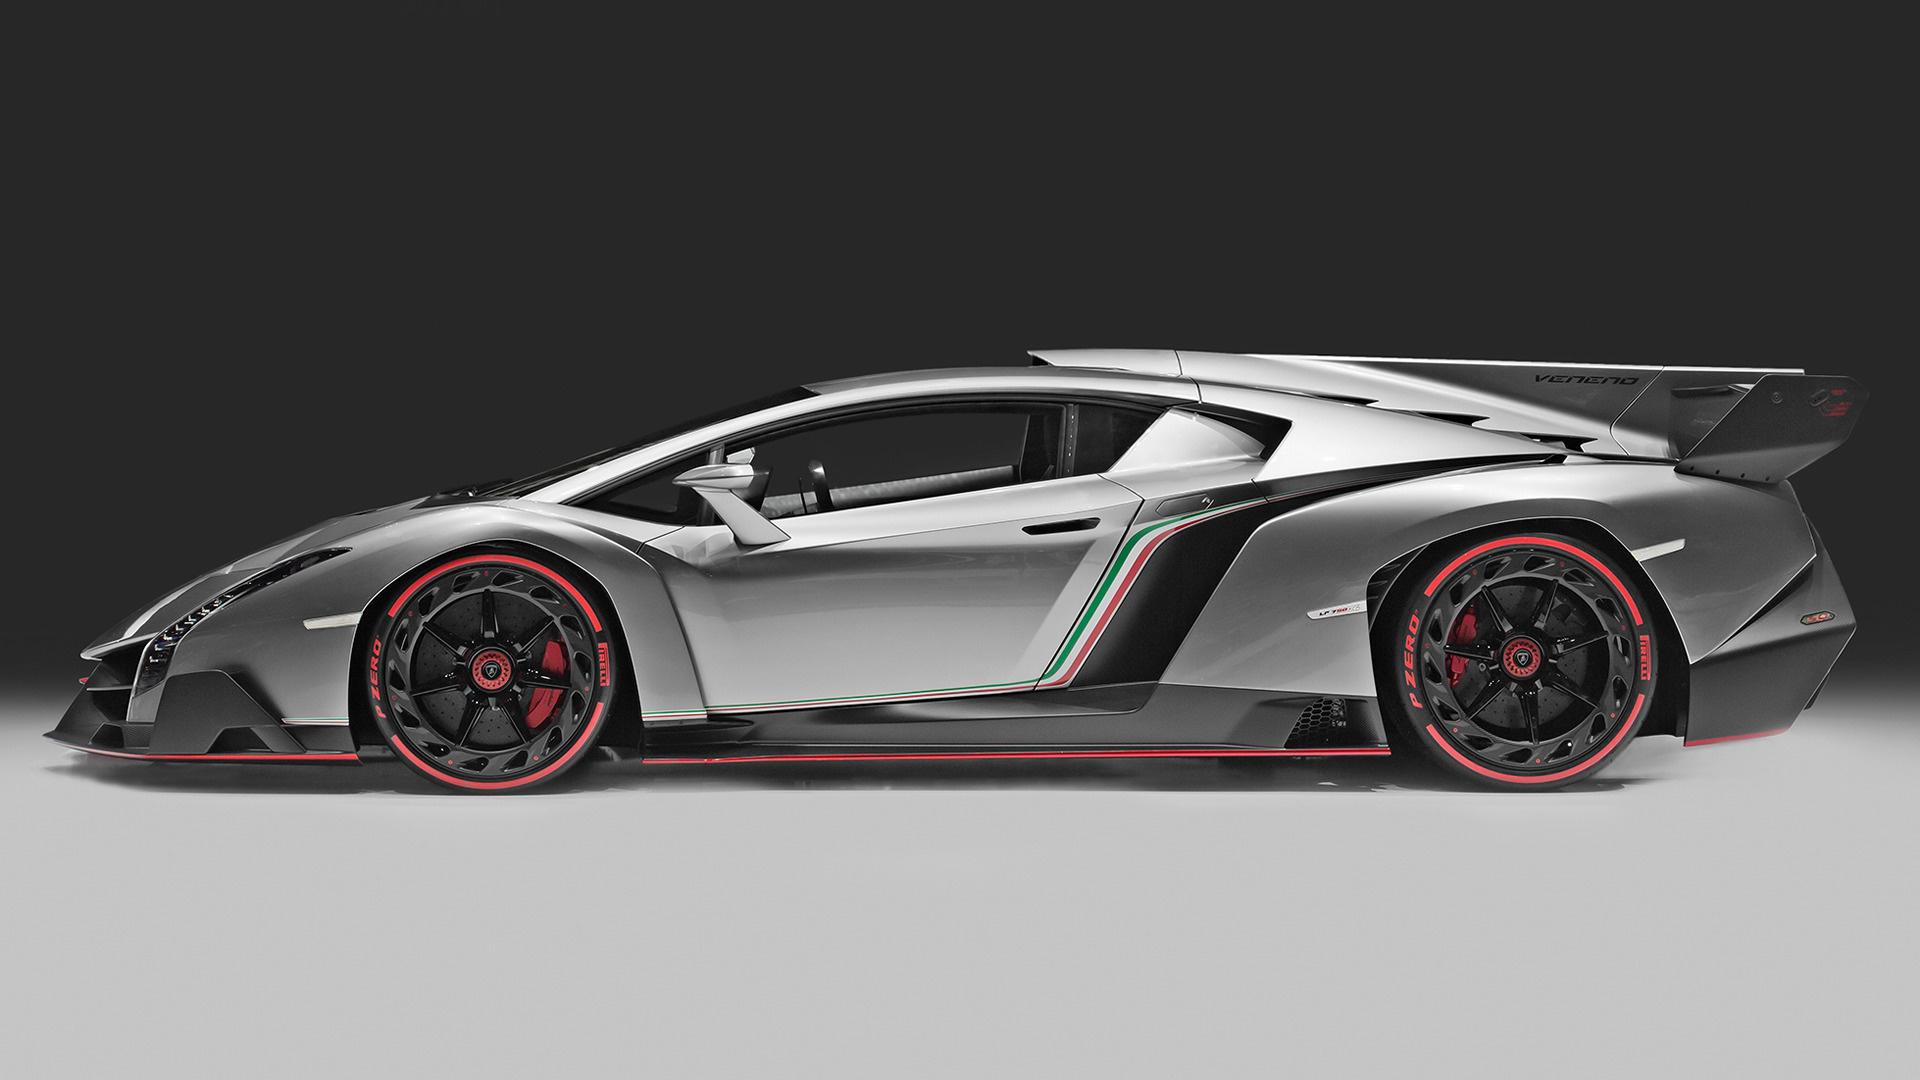 Lamborghini Veneno 2013 Wallpapers And HD Images